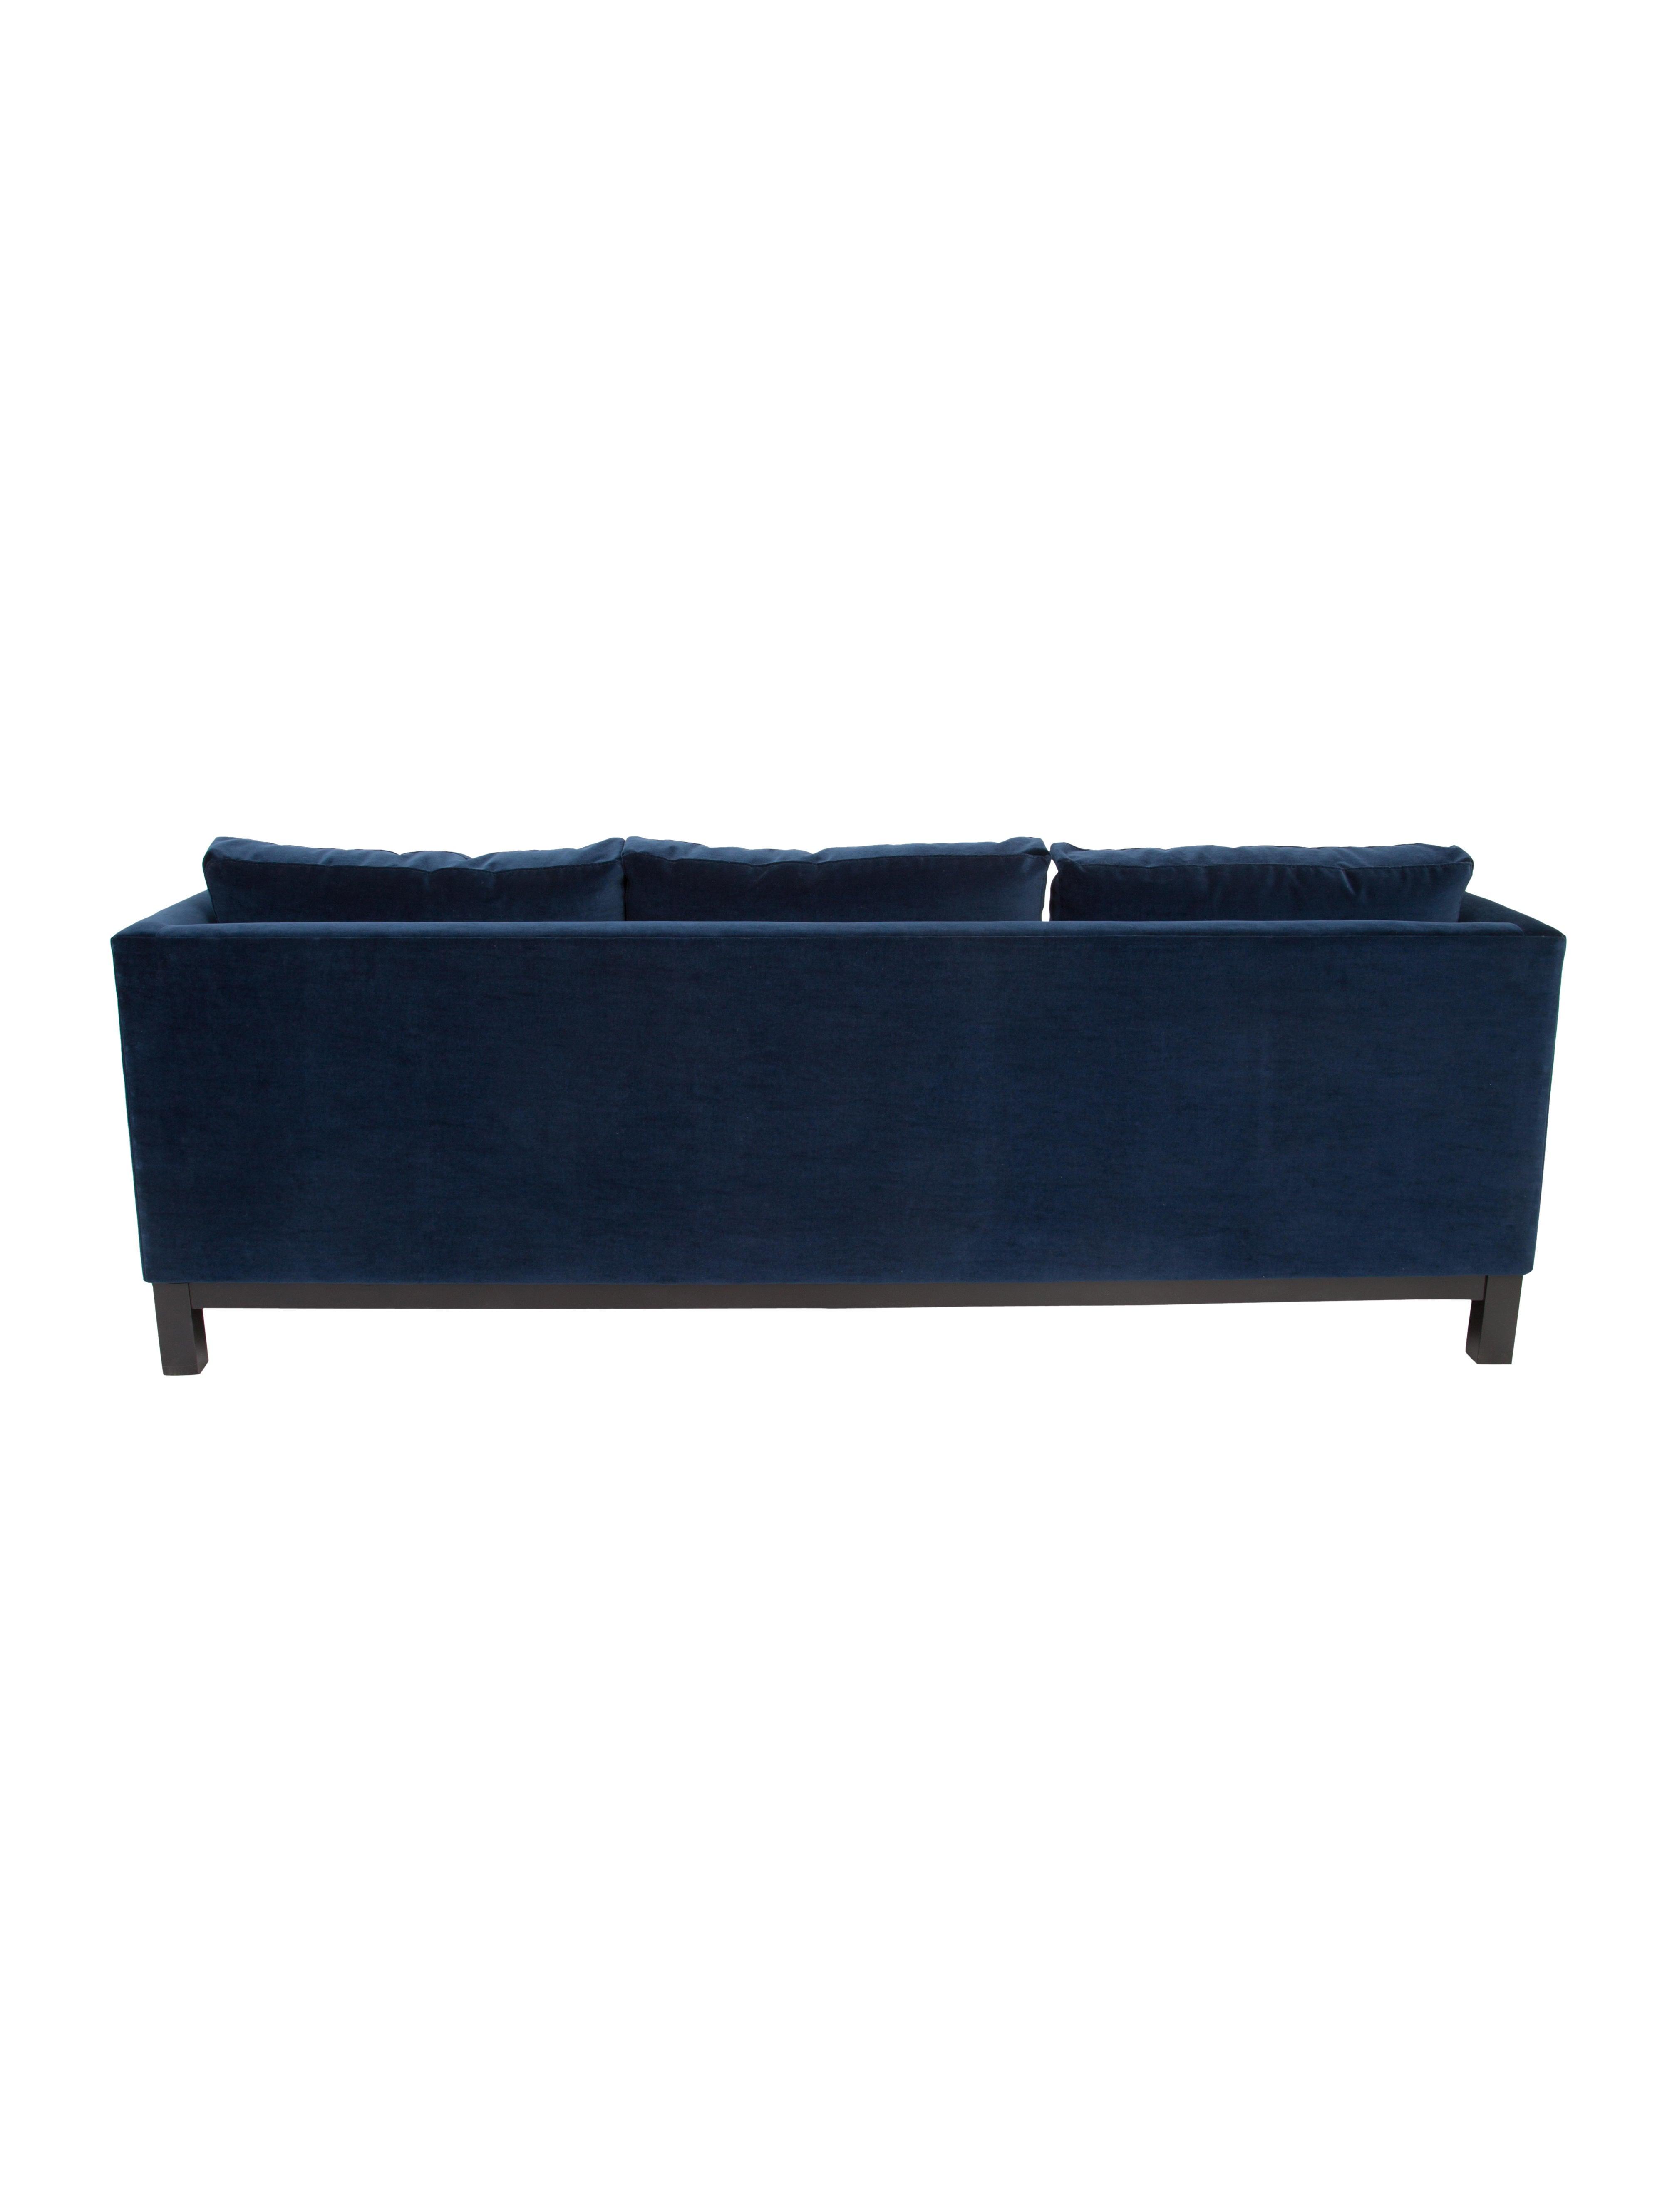 Wonderful Cobble Hill Soho Sofa